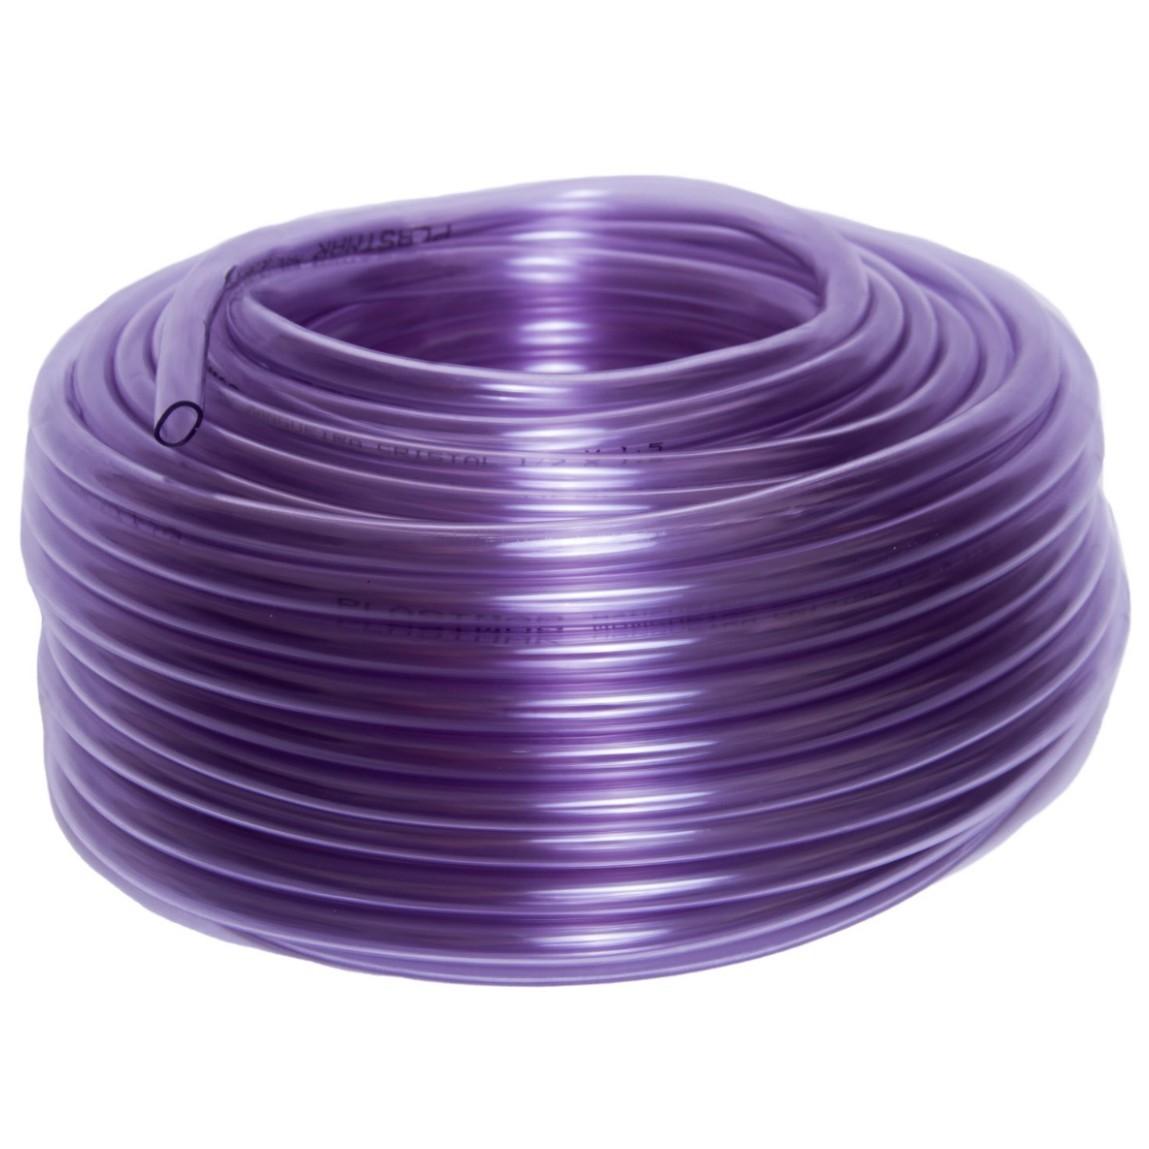 Mangueira de PVC 20m 34 Roxa 804 - Plastmar